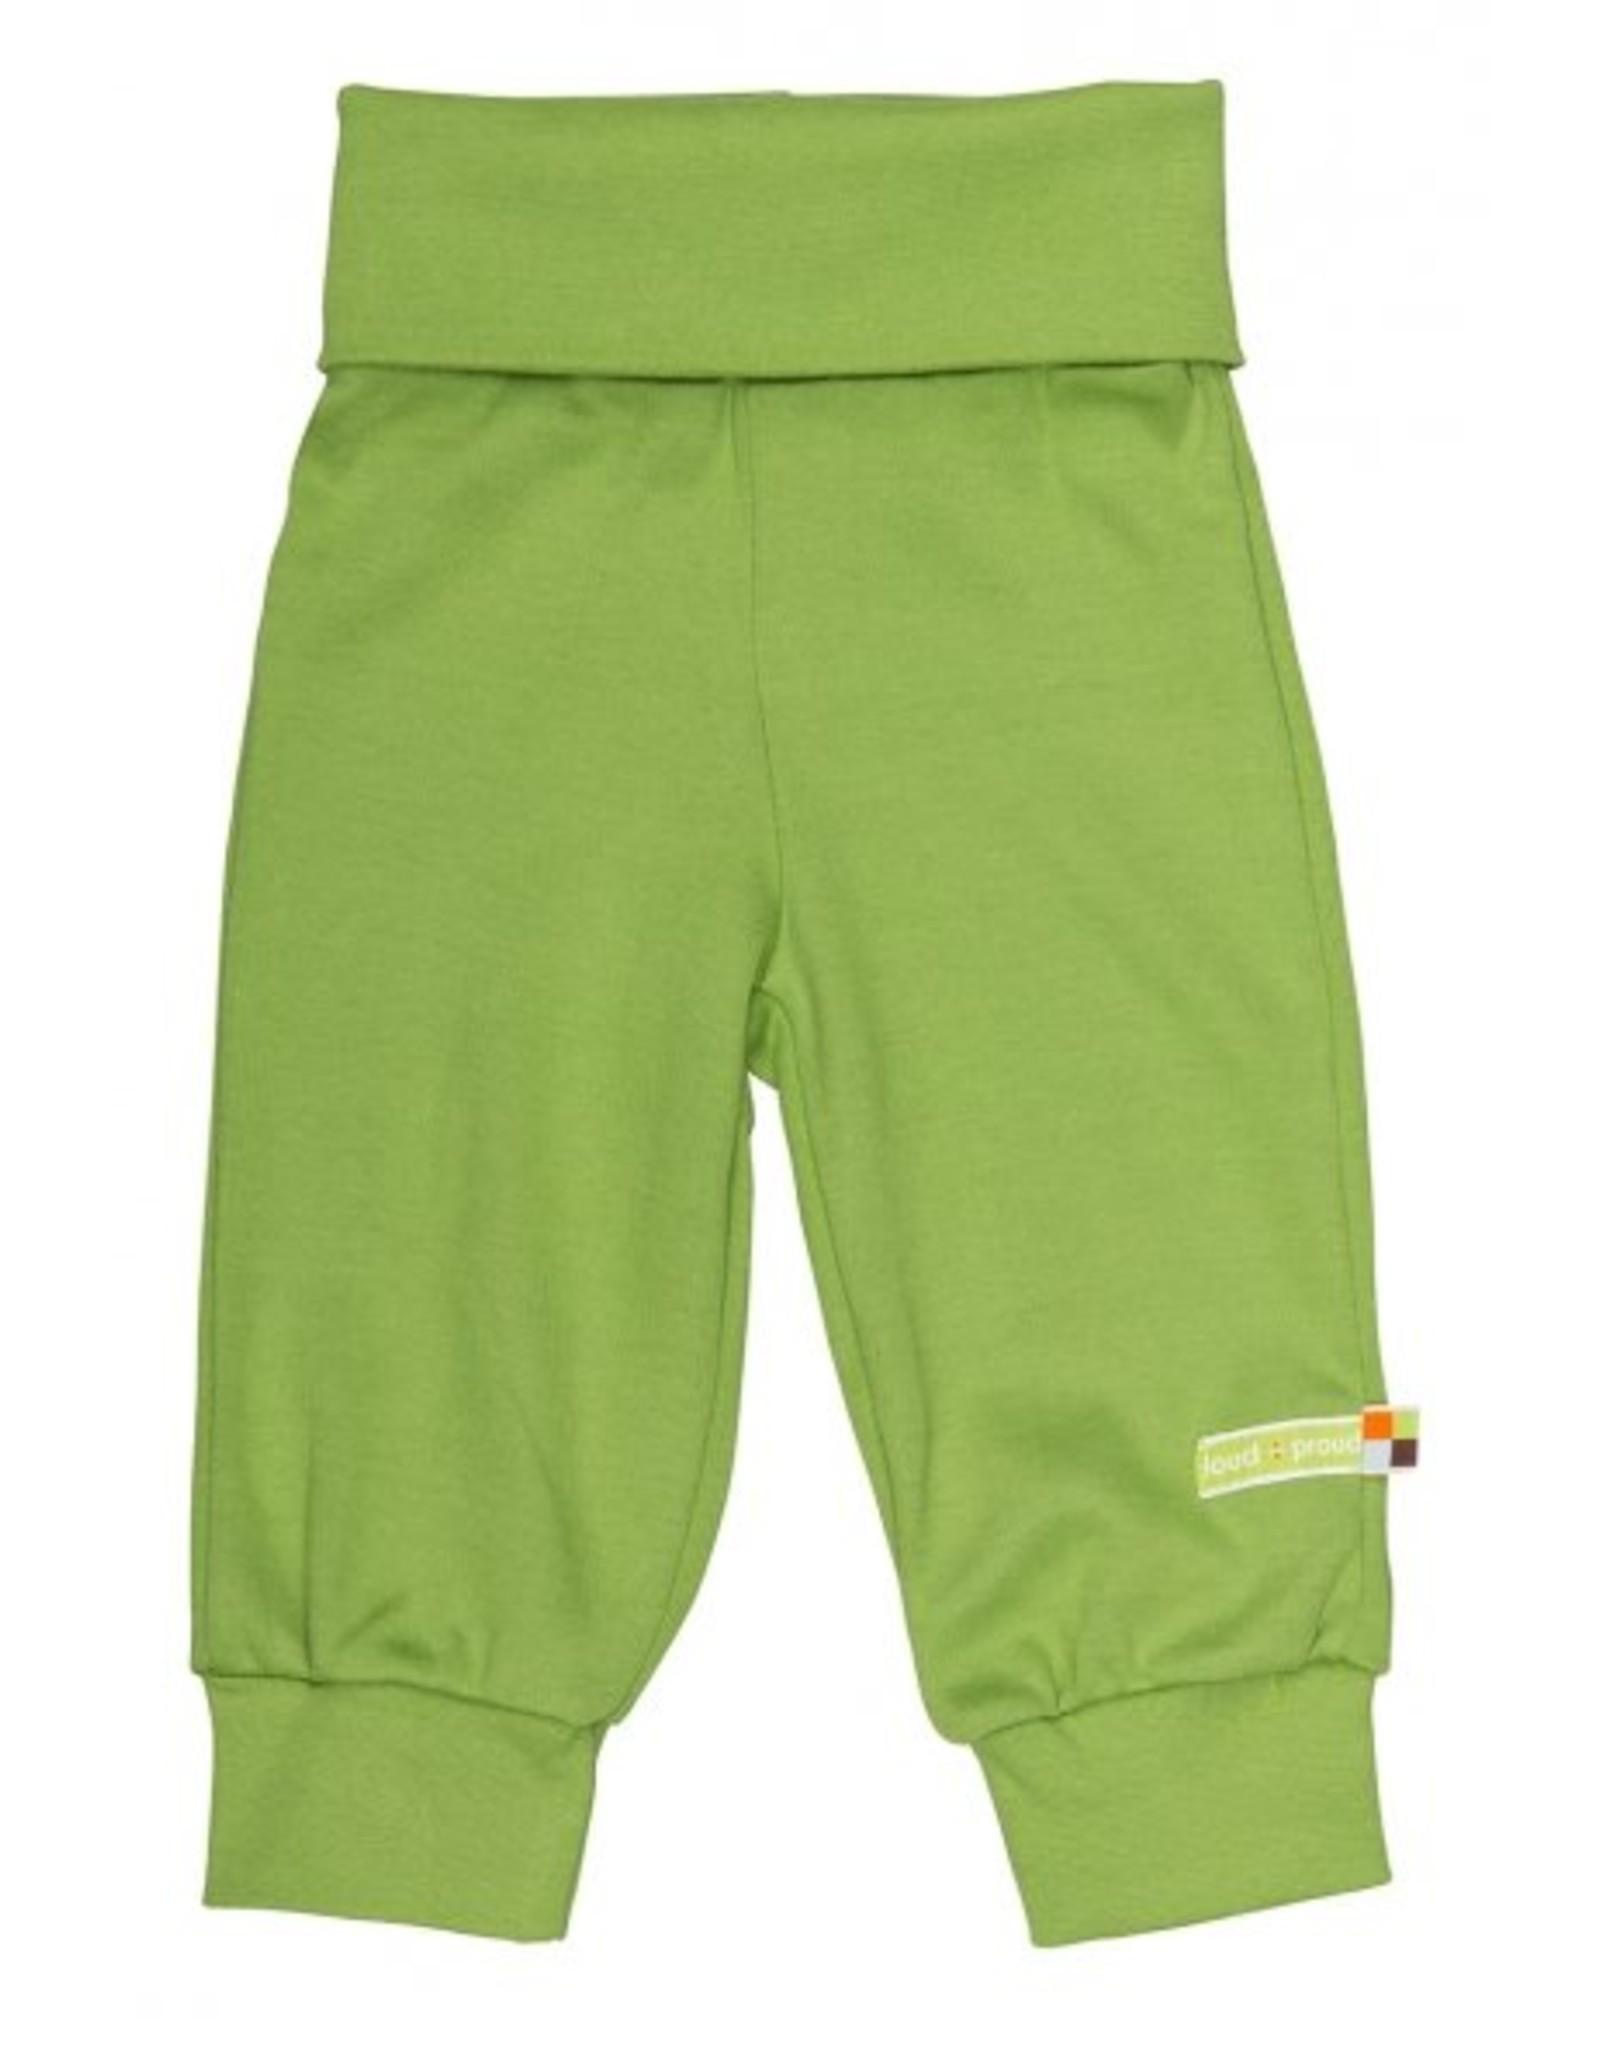 loud+proud Children's trousers - green